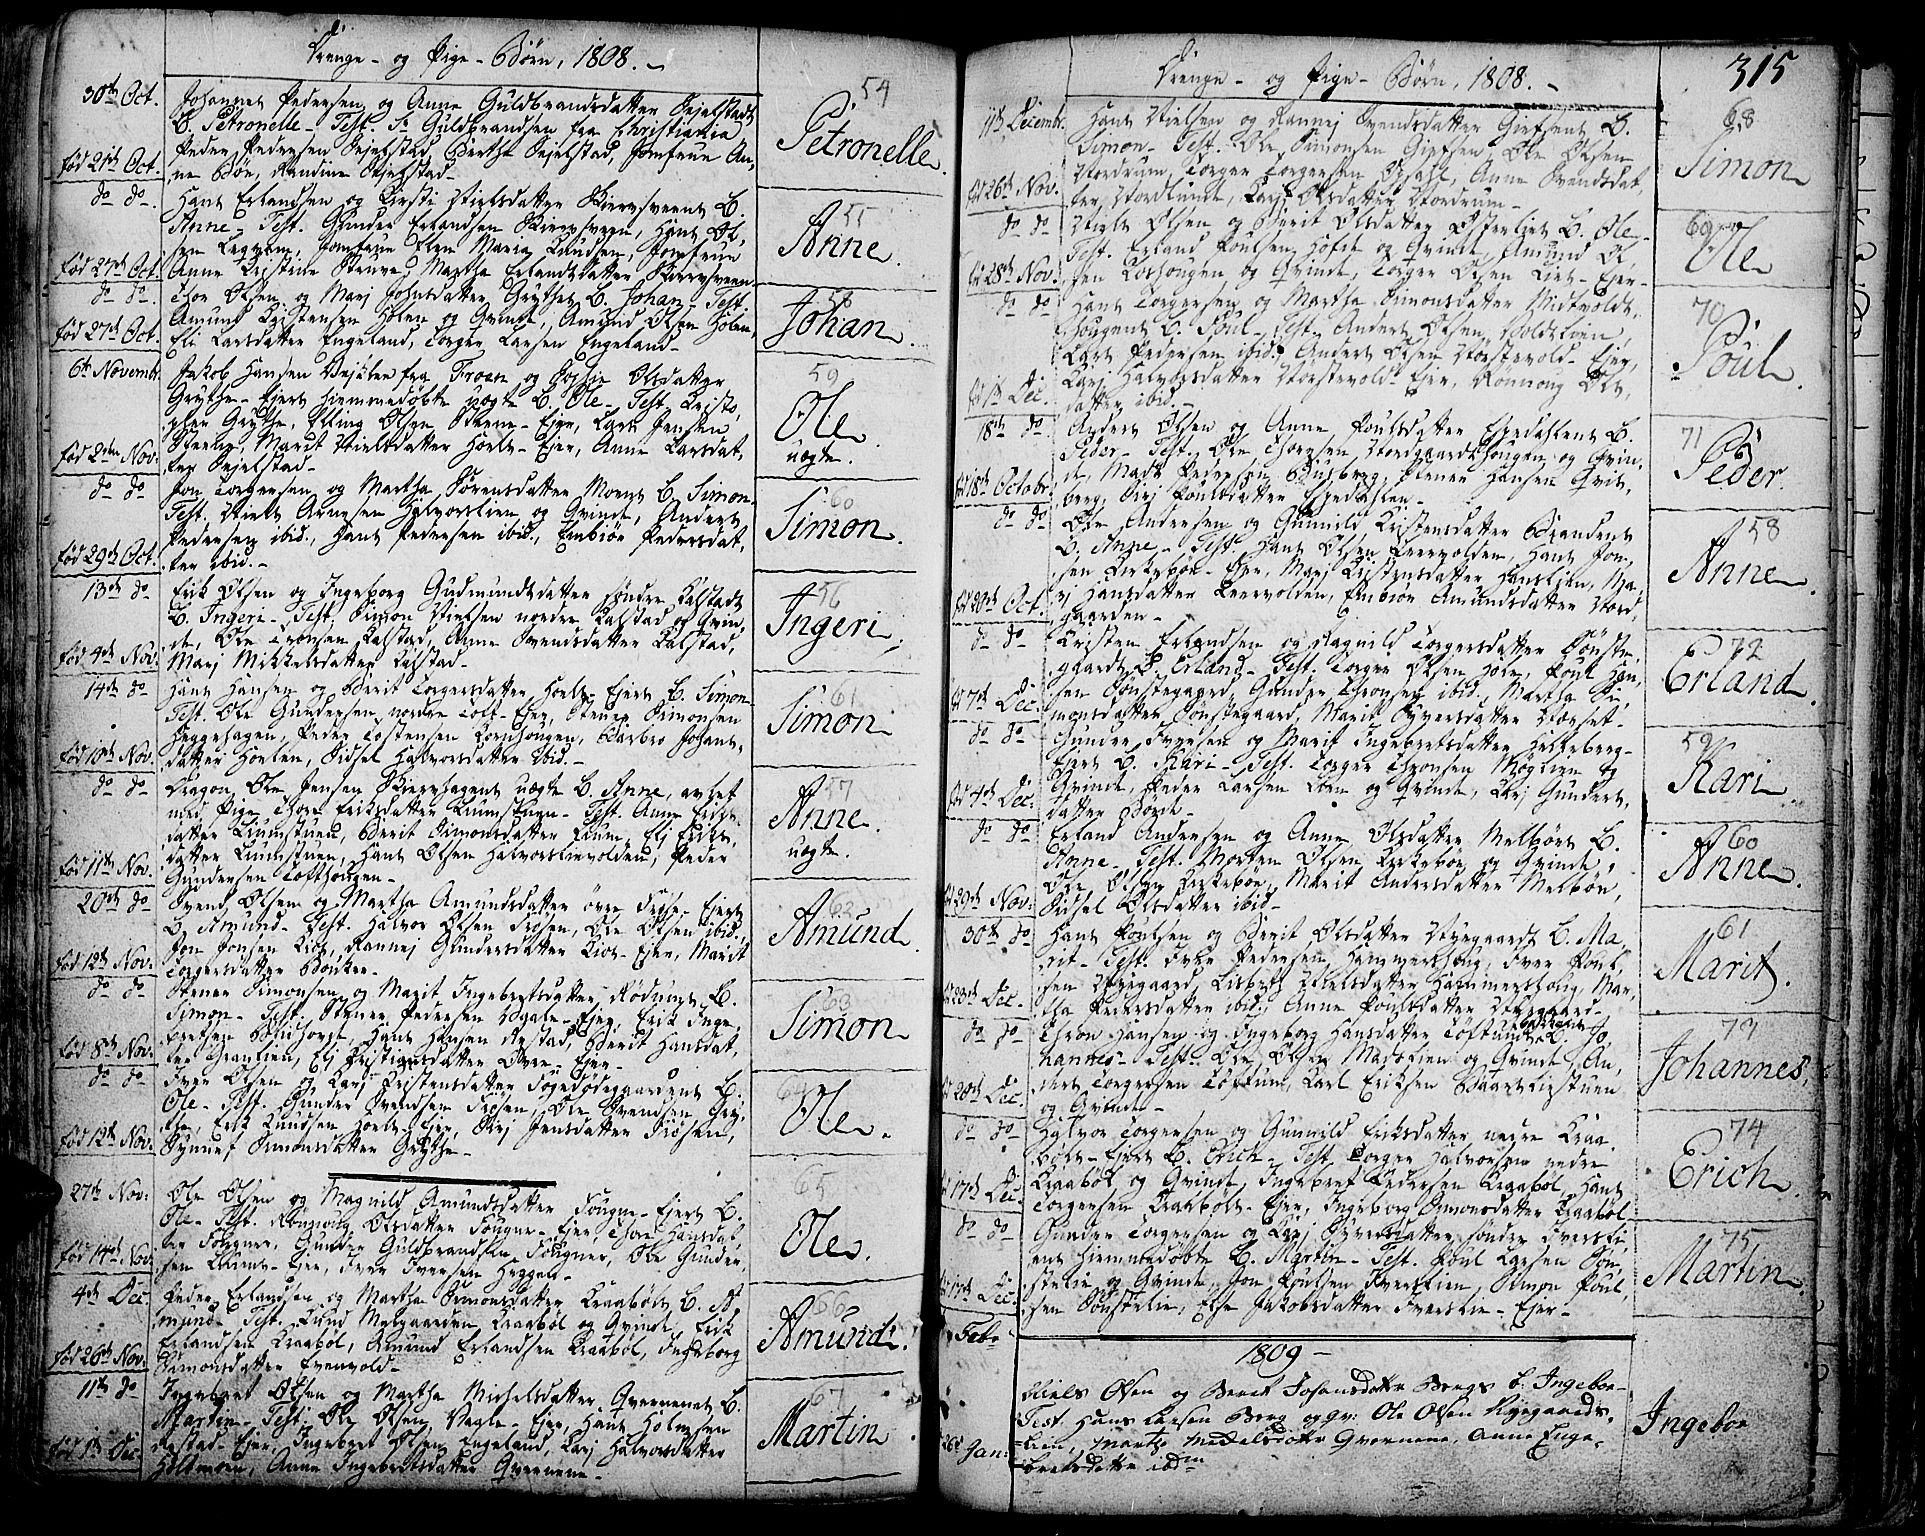 SAH, Gausdal prestekontor, Ministerialbok nr. 3, 1758-1809, s. 315